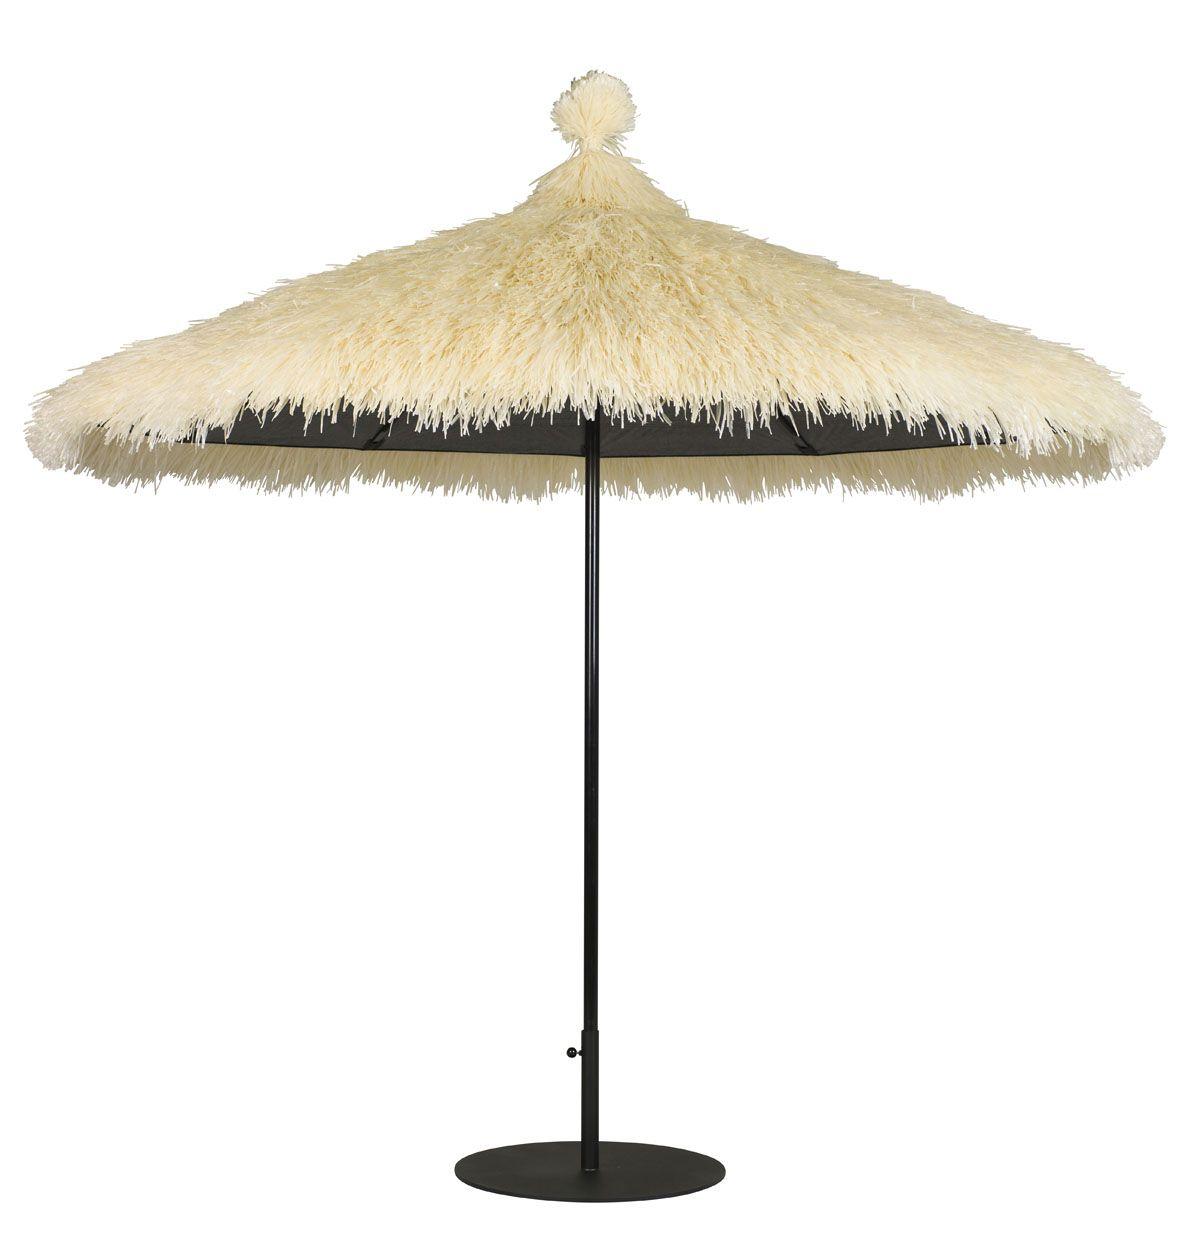 Tahiti Parasol Tropical Umbrella Designed Mark